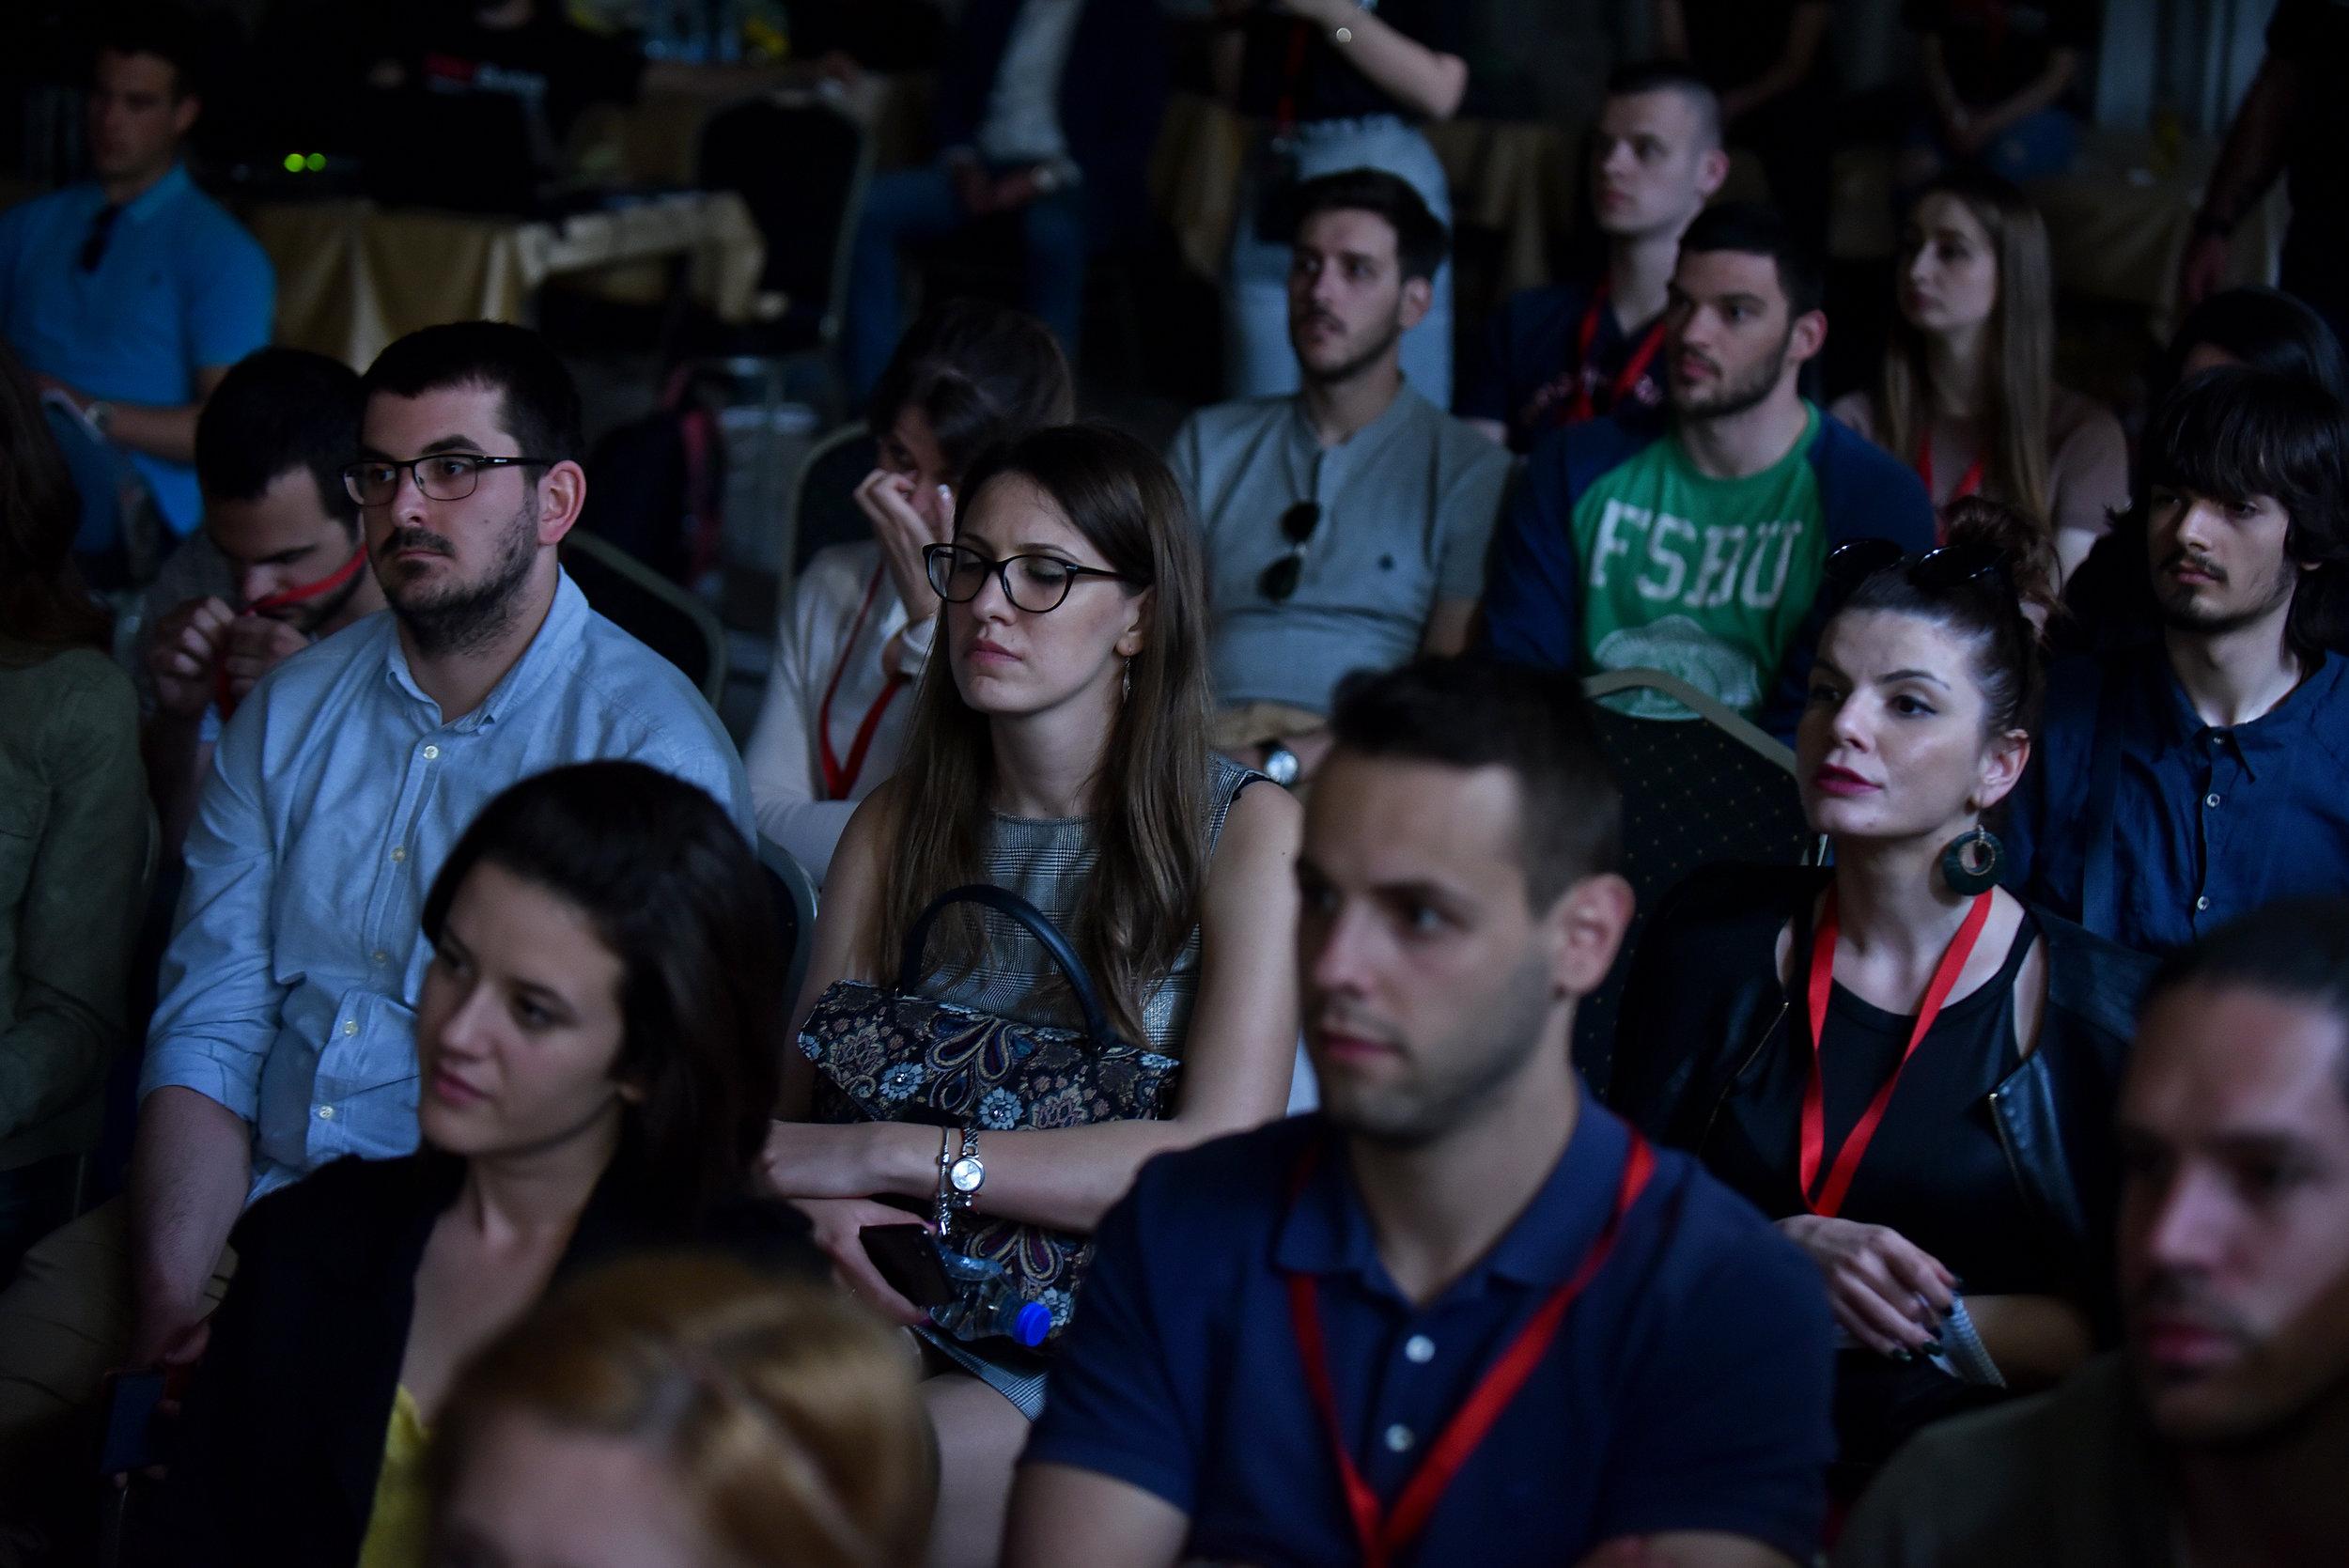 Recap of TEDx - Article by Ivan Radonjic, 18 April 2018